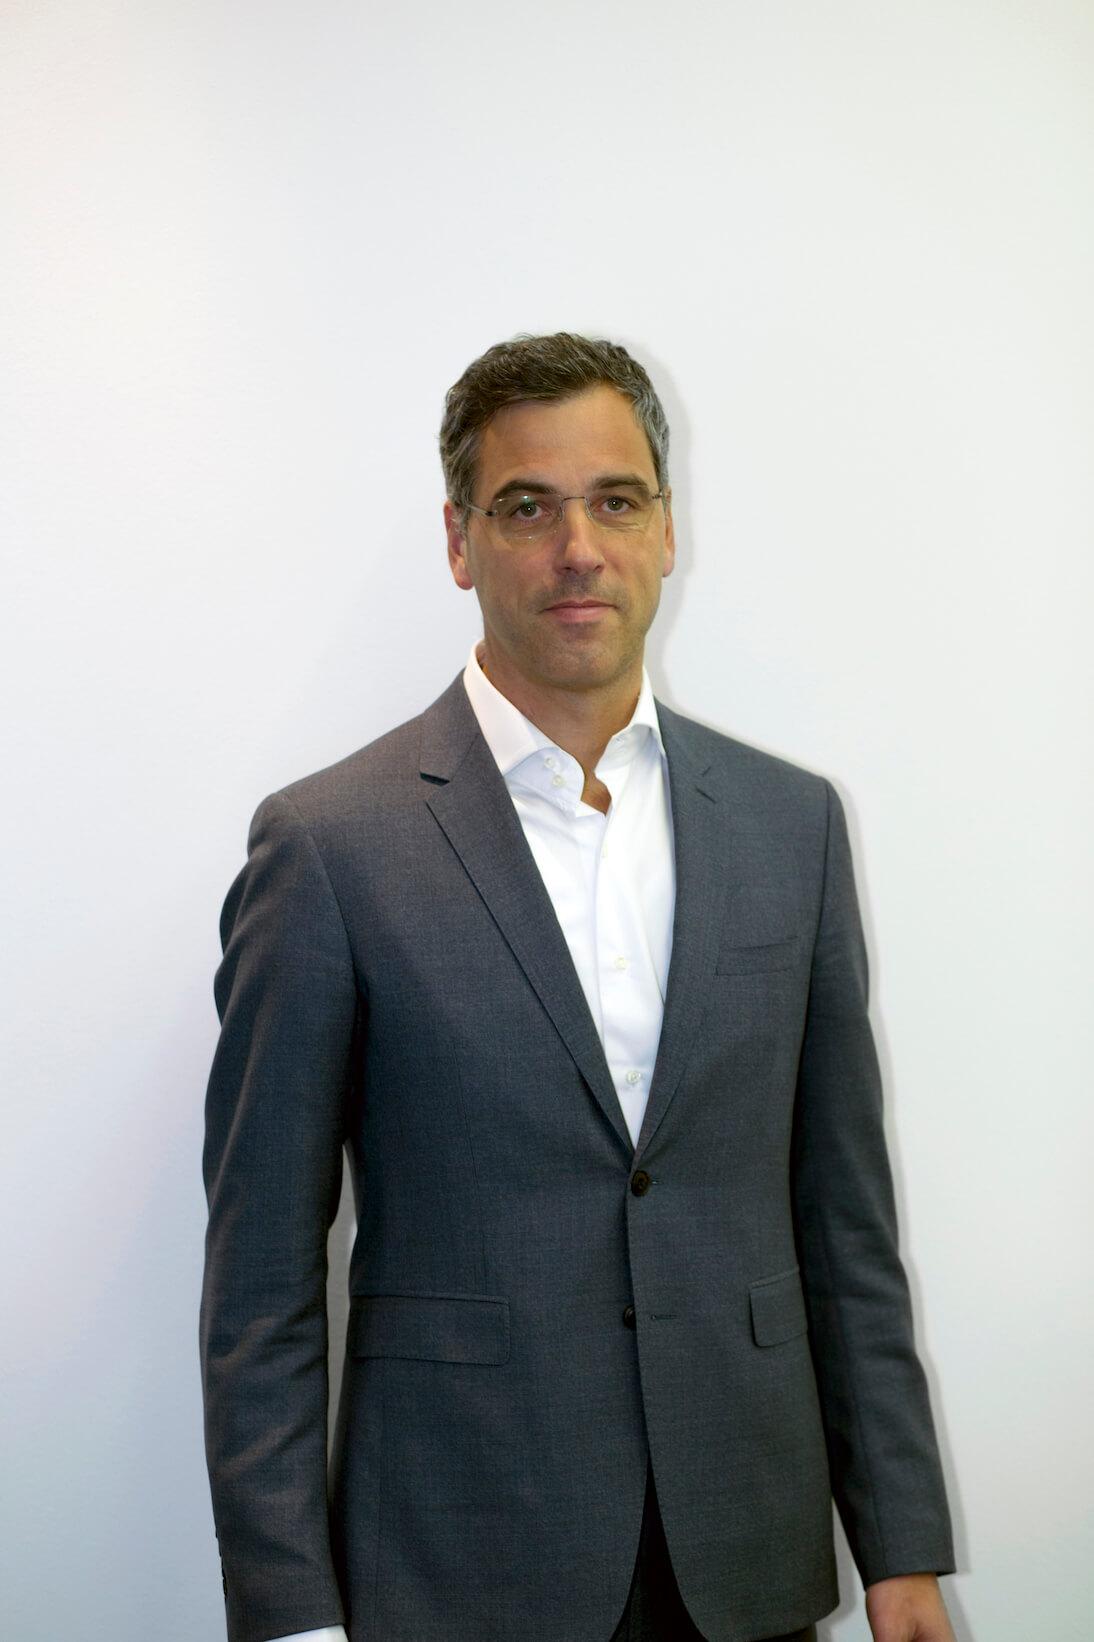 Charles Dupont van Schroders